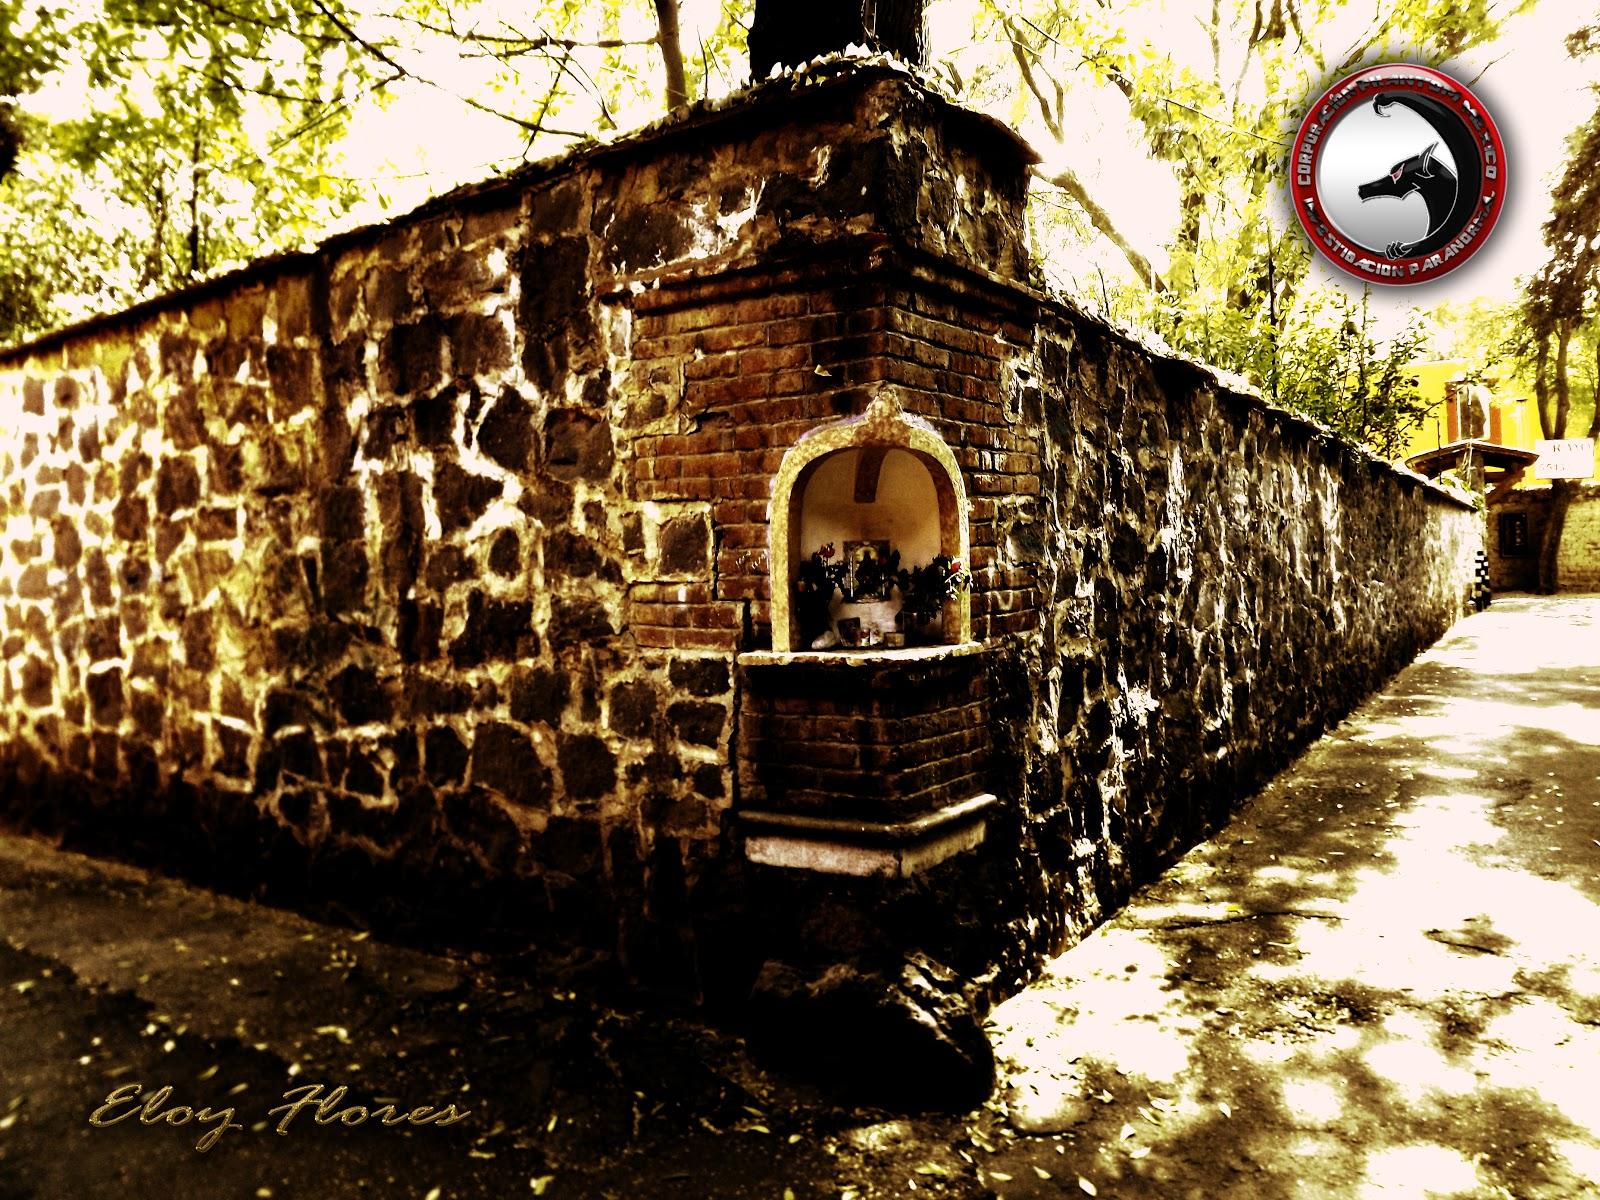 MEXICO MISTERIOSO: El Callejón del Aguacate - Coyoacán